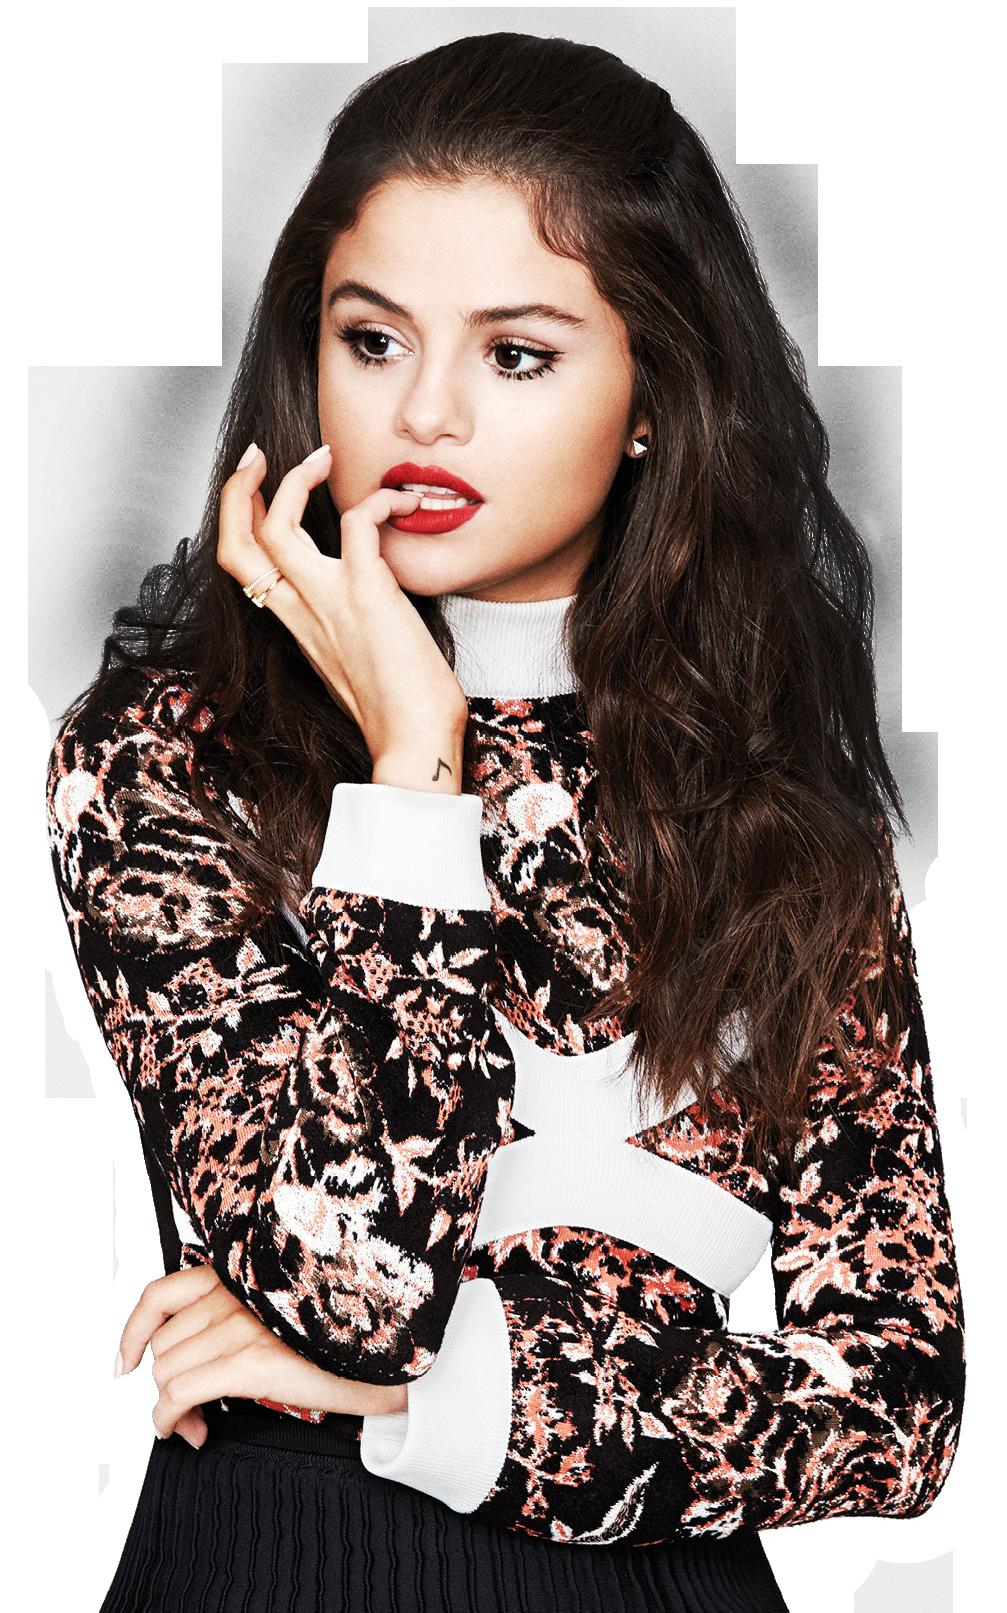 Selena Gomez Dress Png Png Image - Selena Gomez, Transparent background PNG HD thumbnail